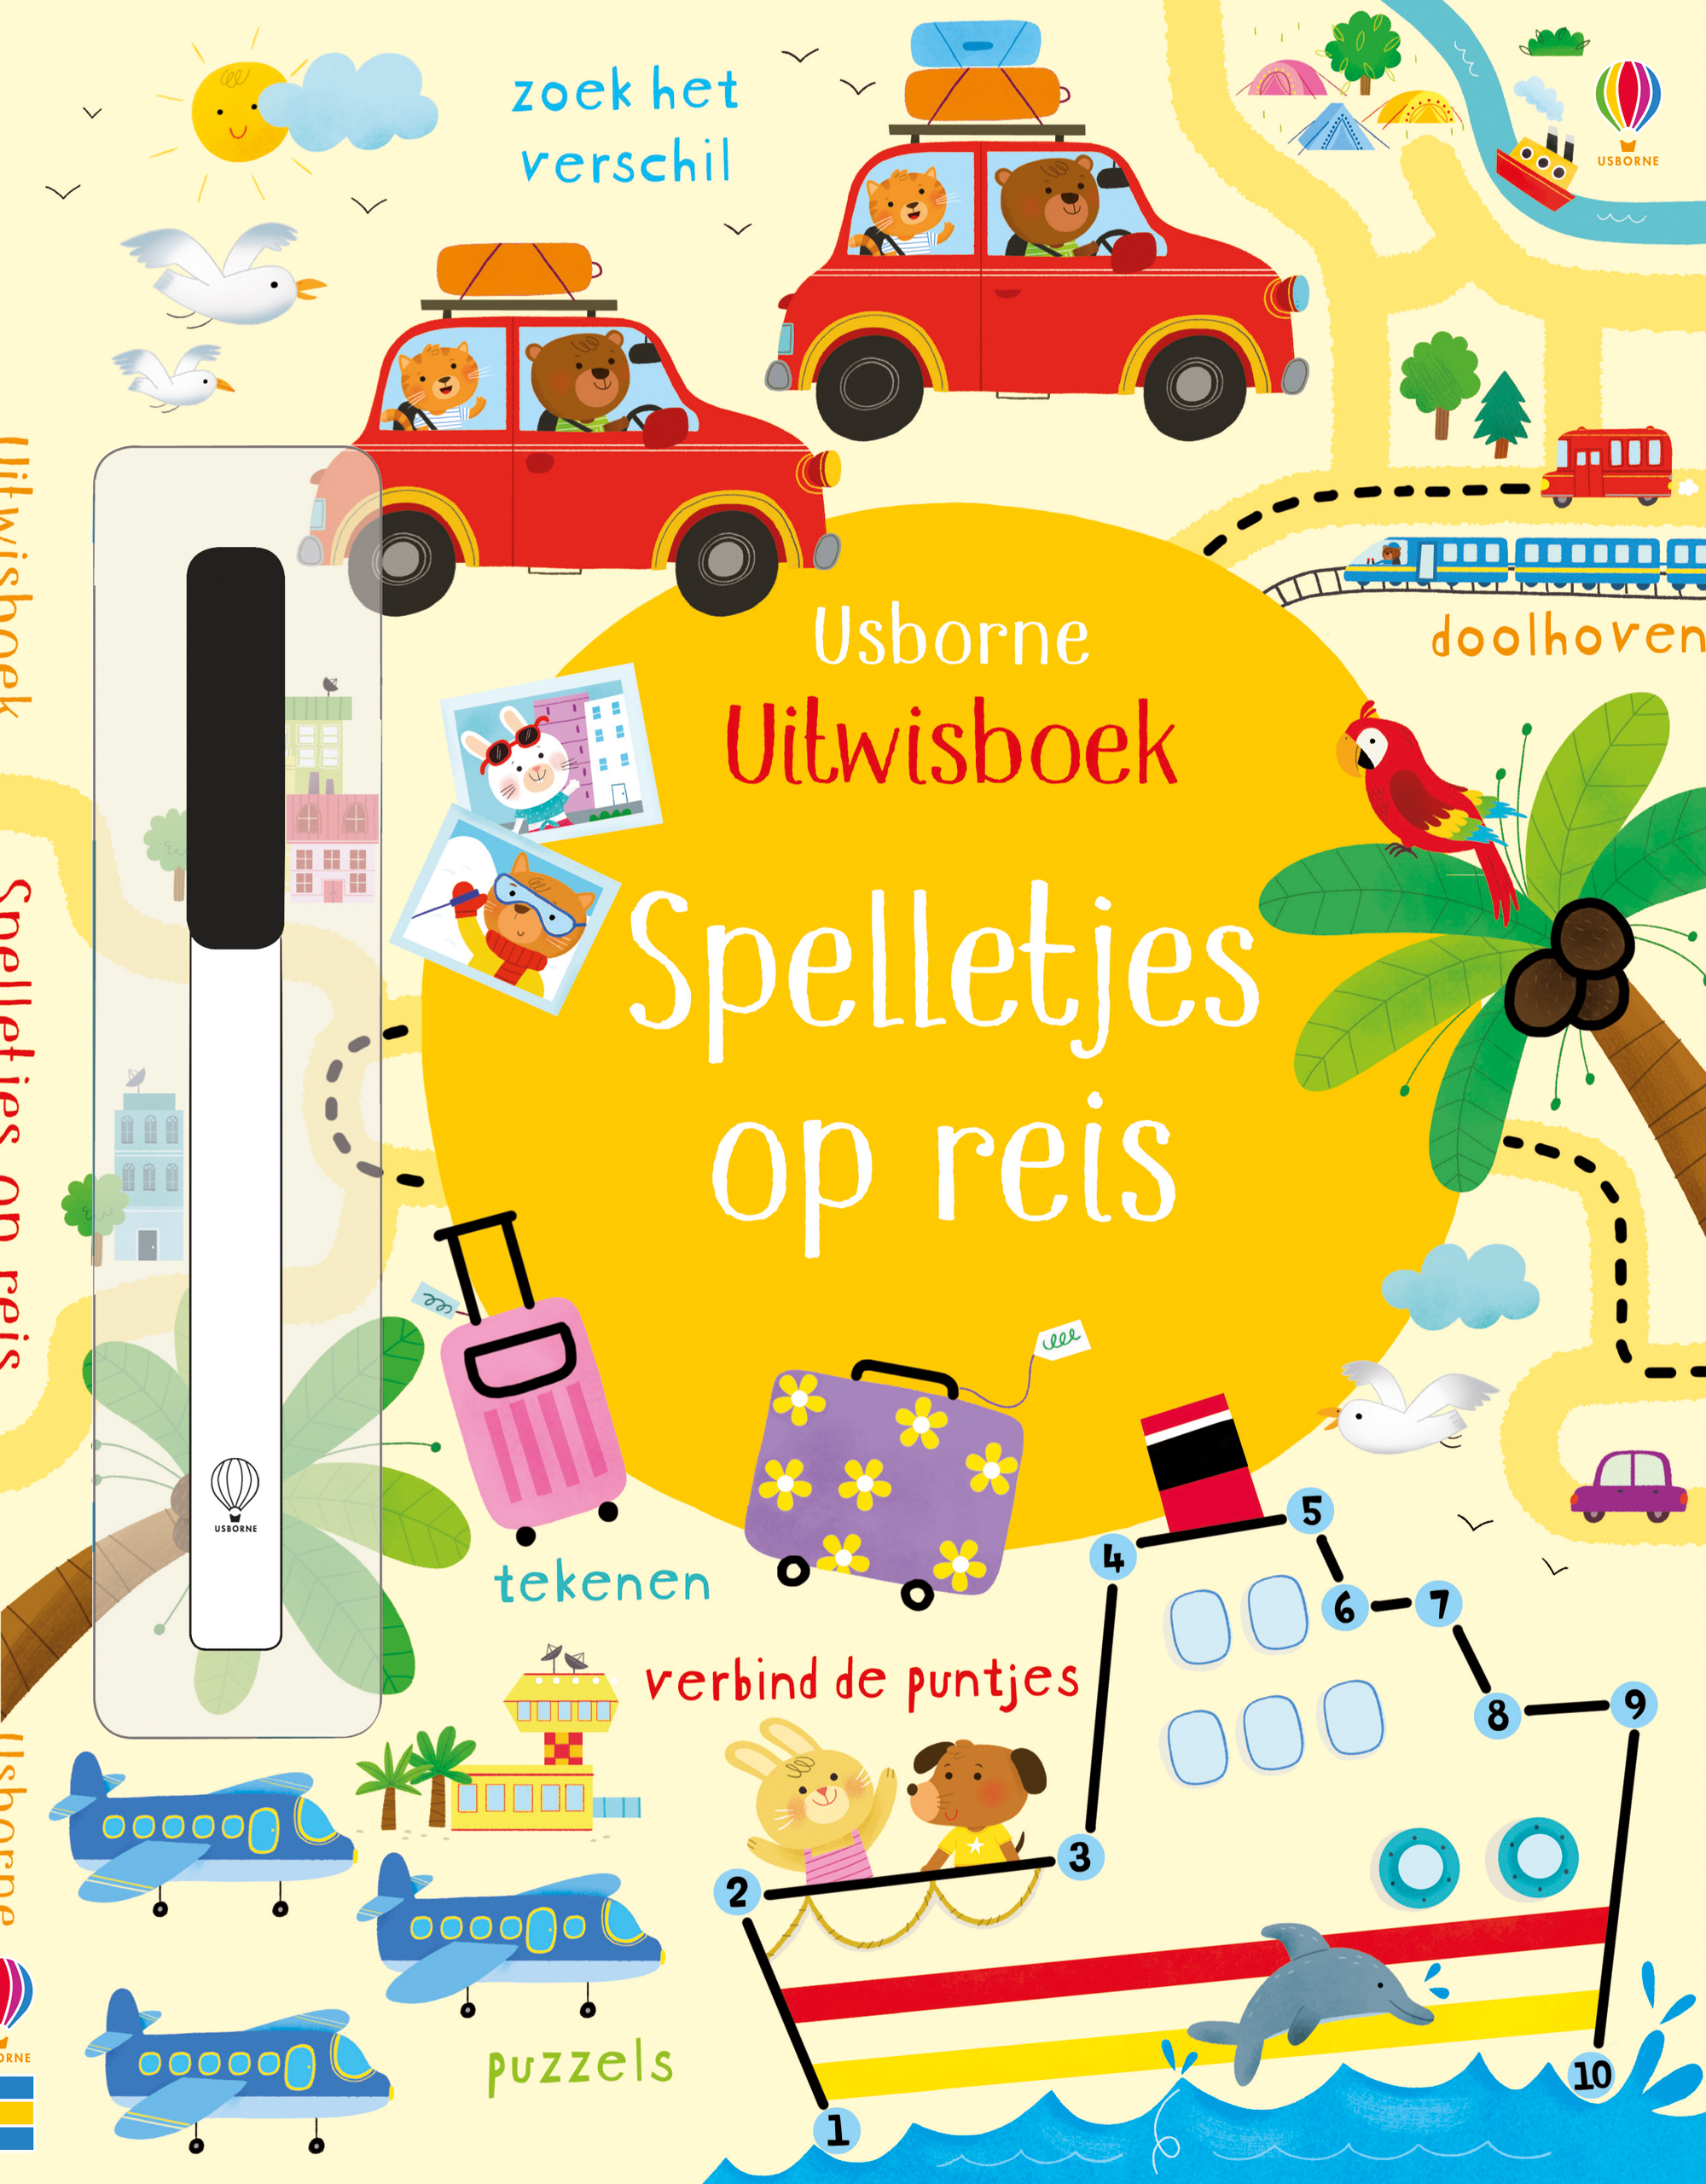 Spelletjes op reis – Uitwisboek